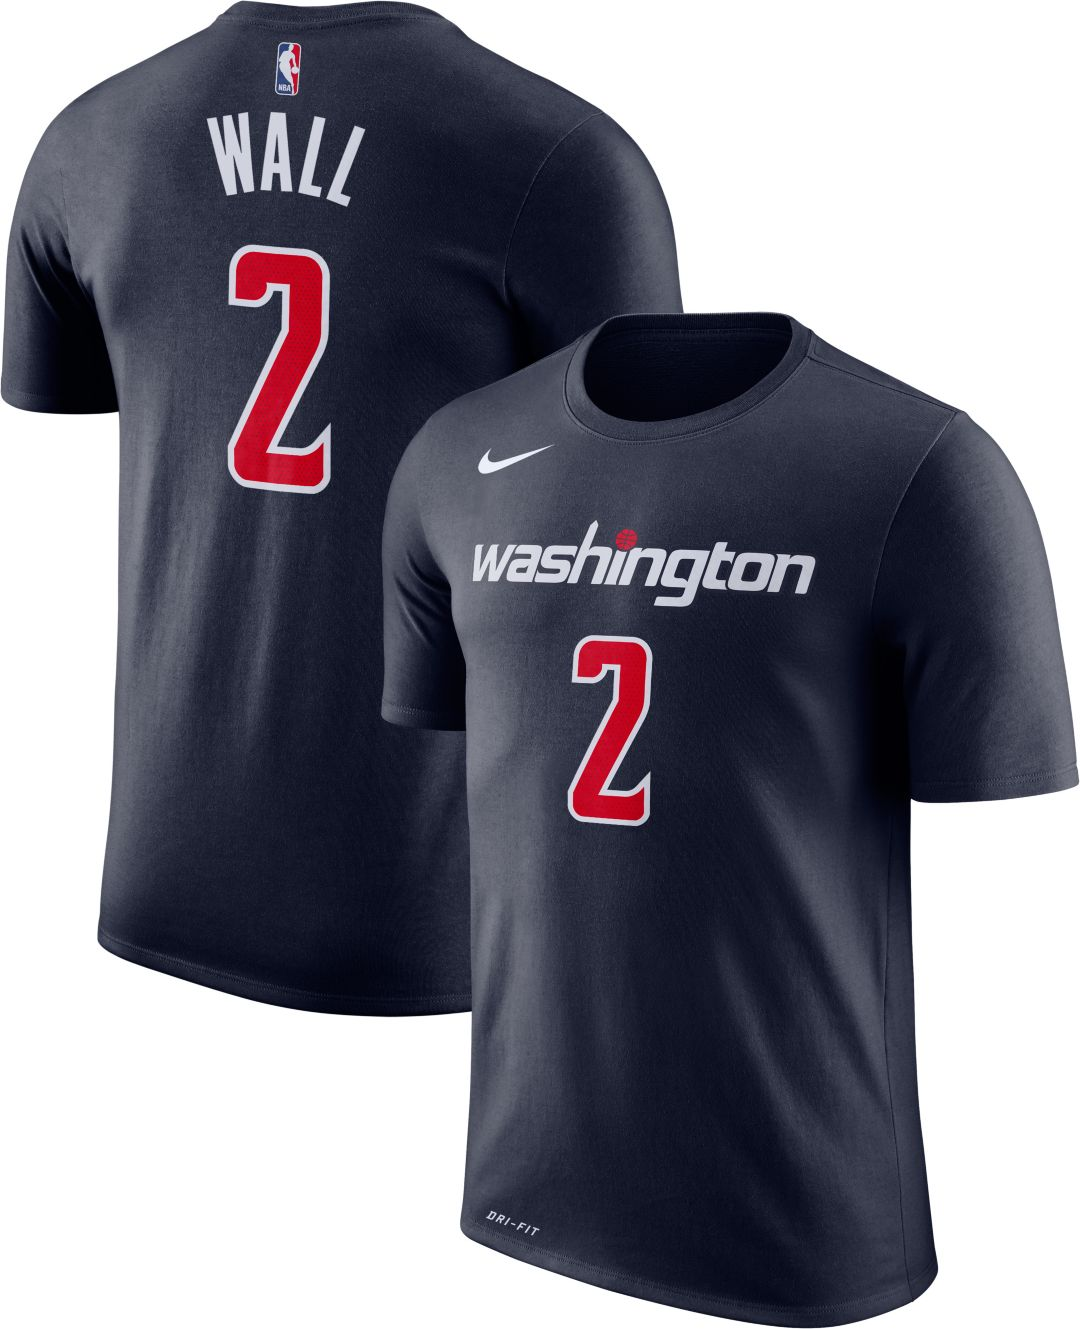 sale retailer bc04e 5a0dd Nike Men's Washington Wizards John Wall #2 Dri-FIT Navy T-Shirt